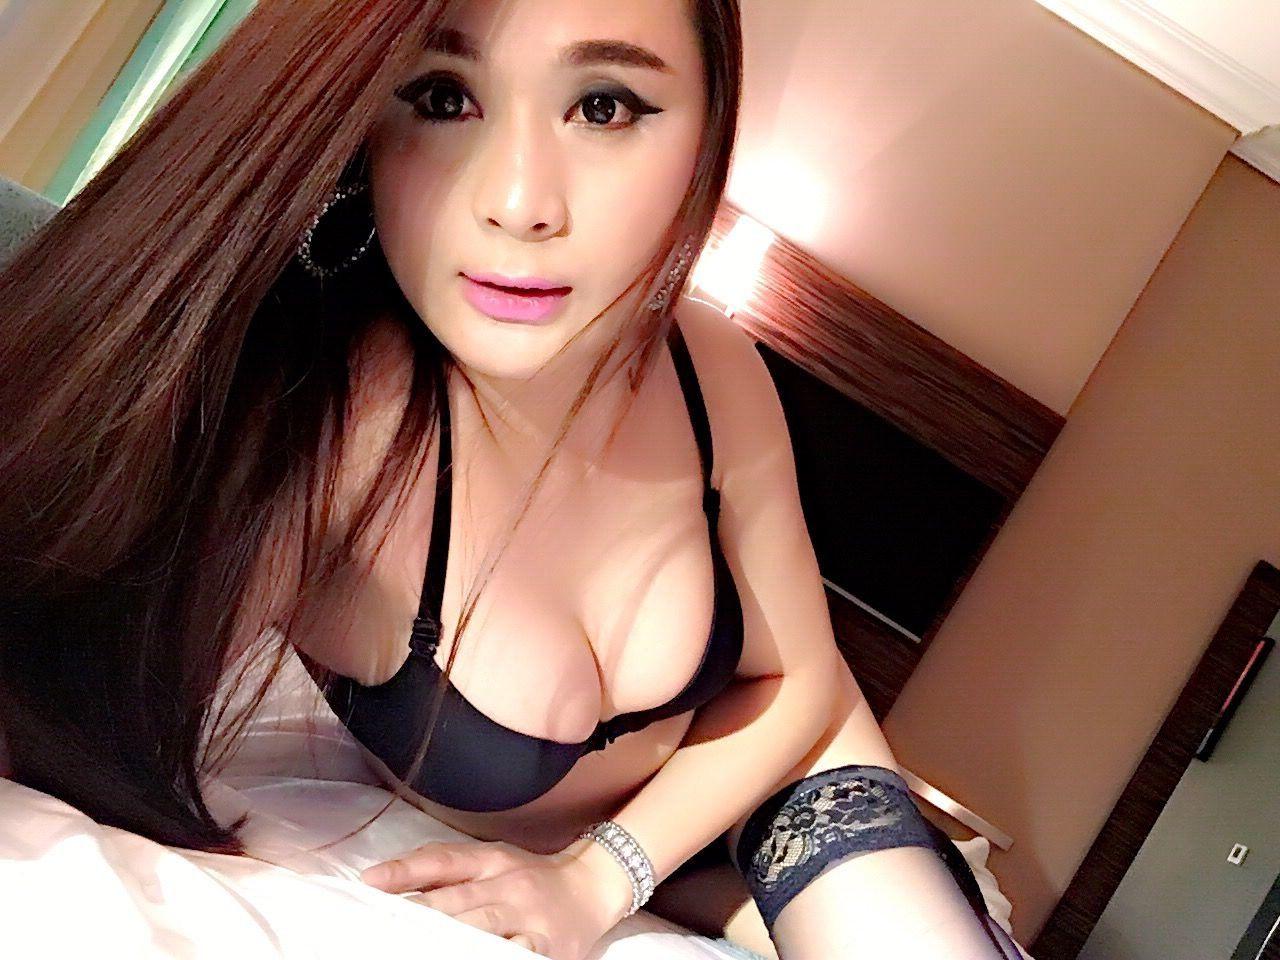 gay beautyqueen - ts Clara, Filipino Transsexual escort in